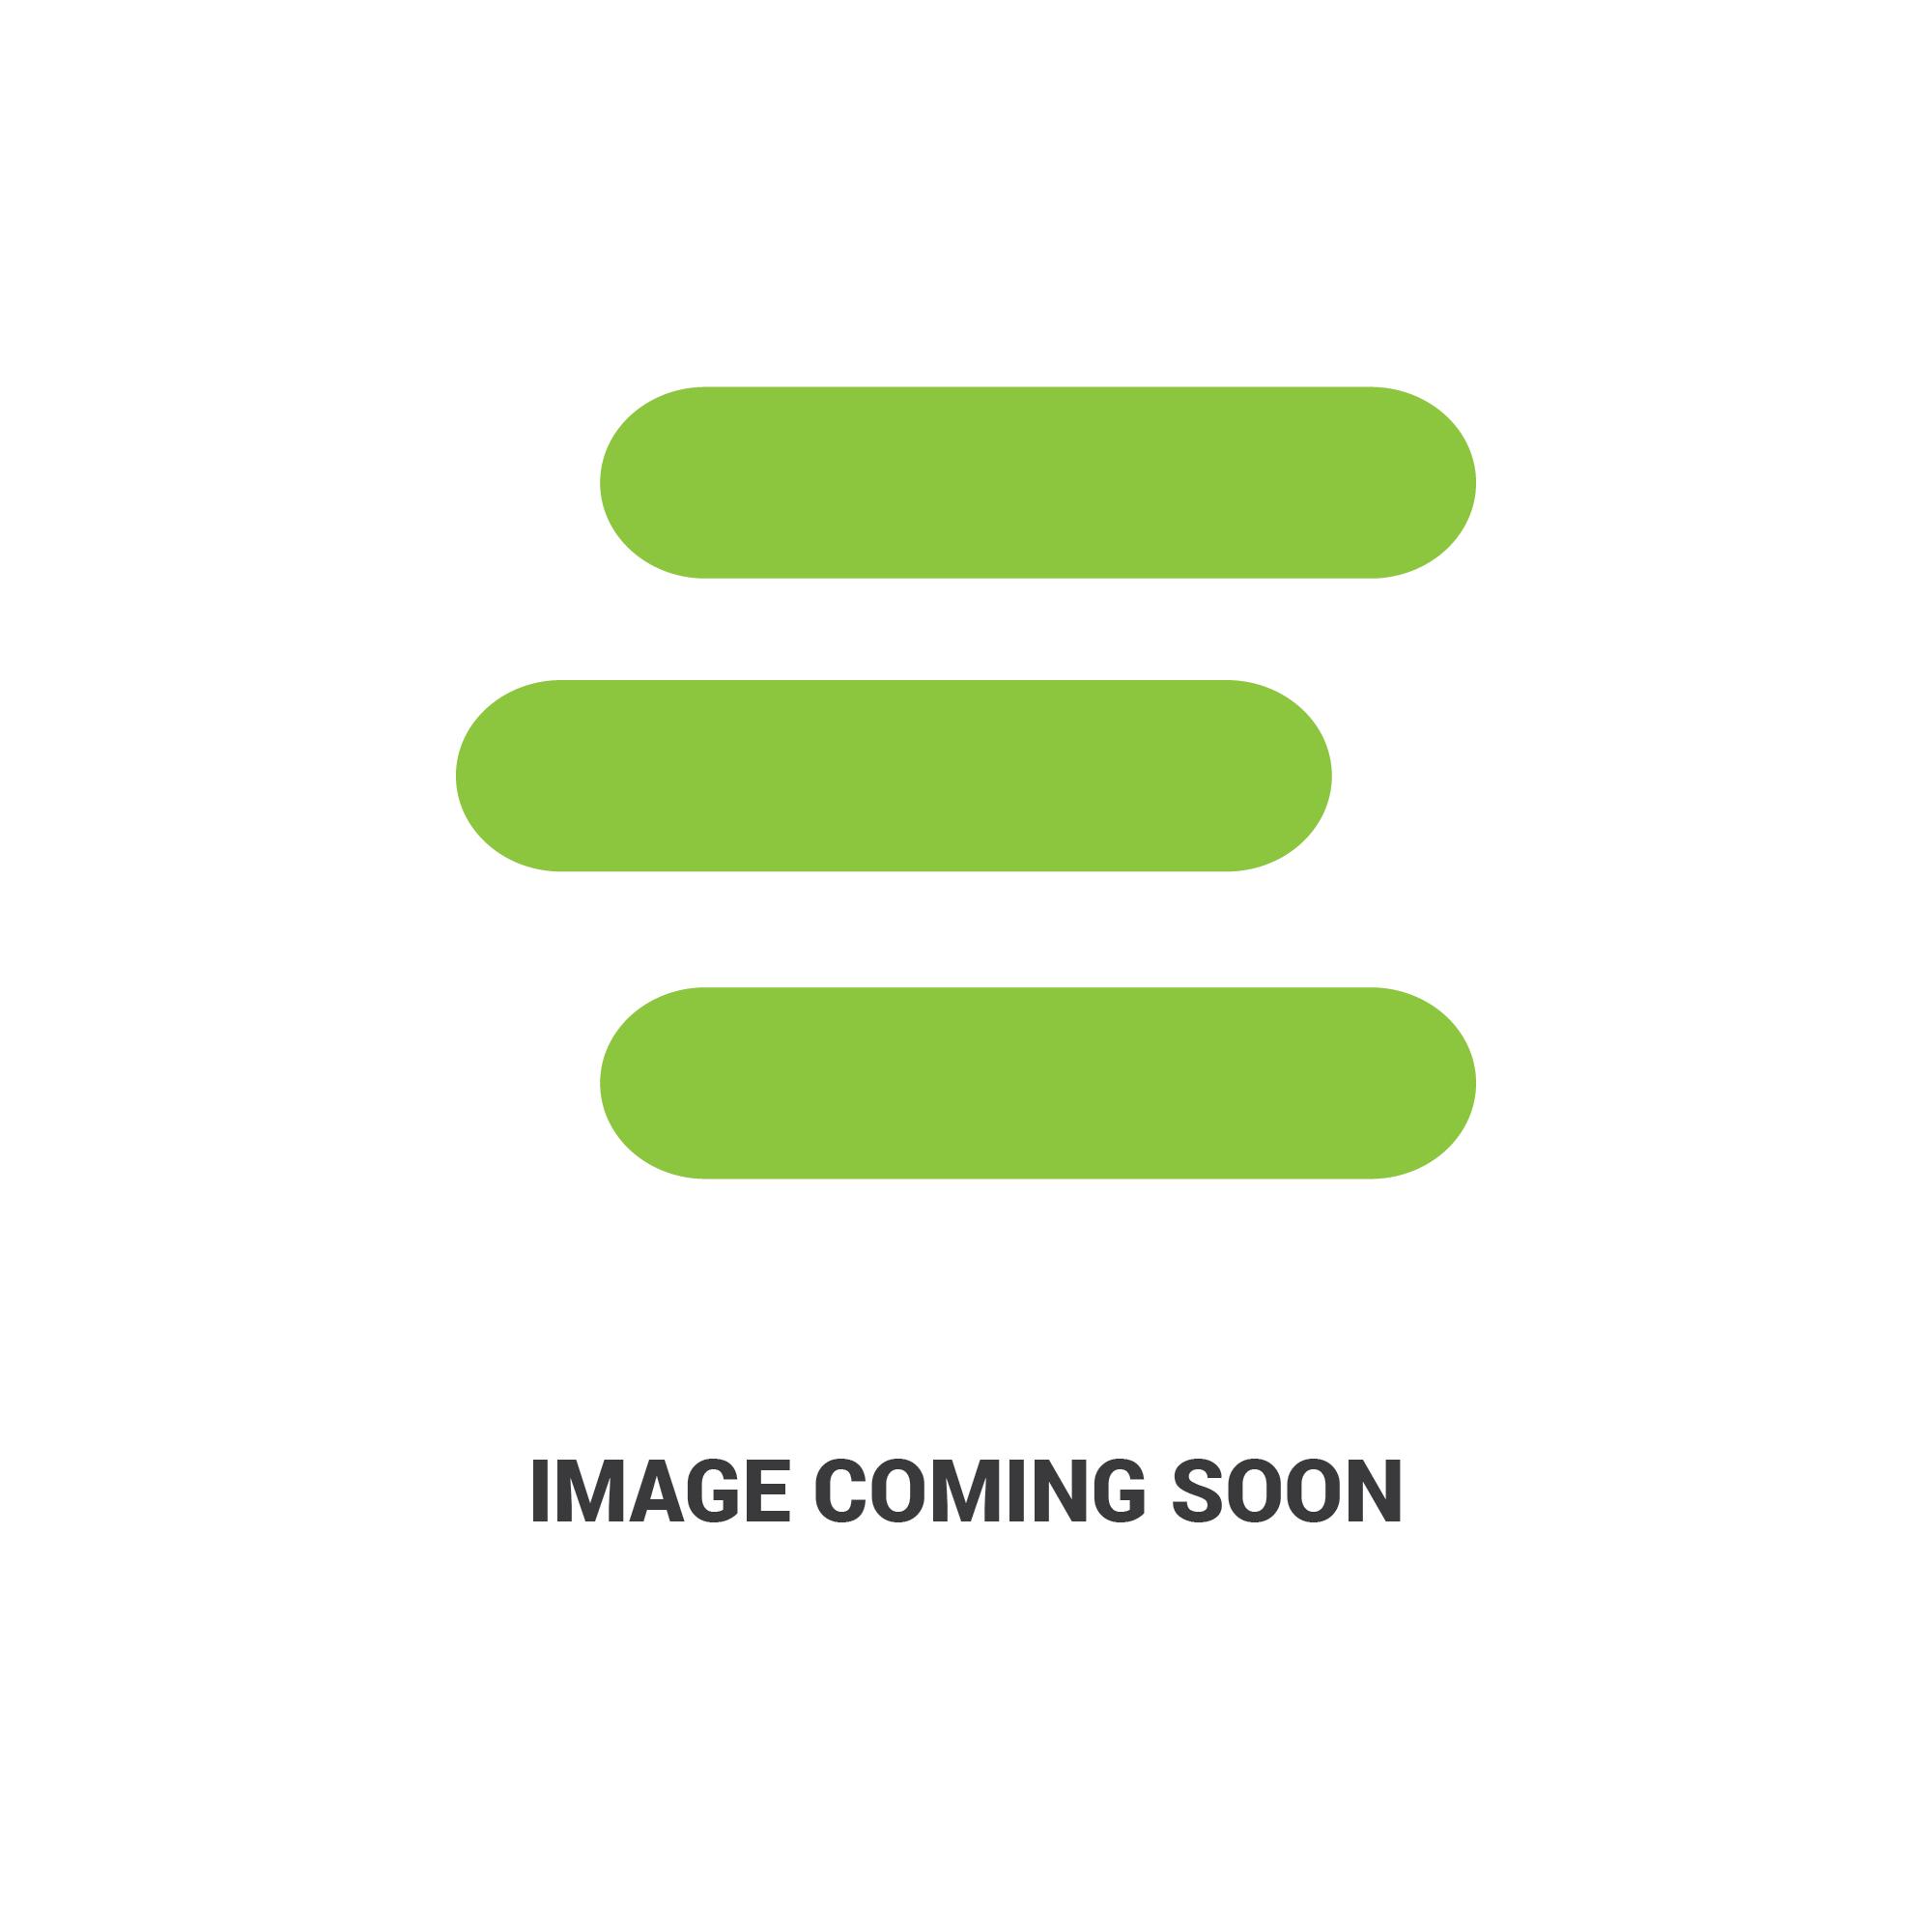 E-6C040-561202266_1 .jpg